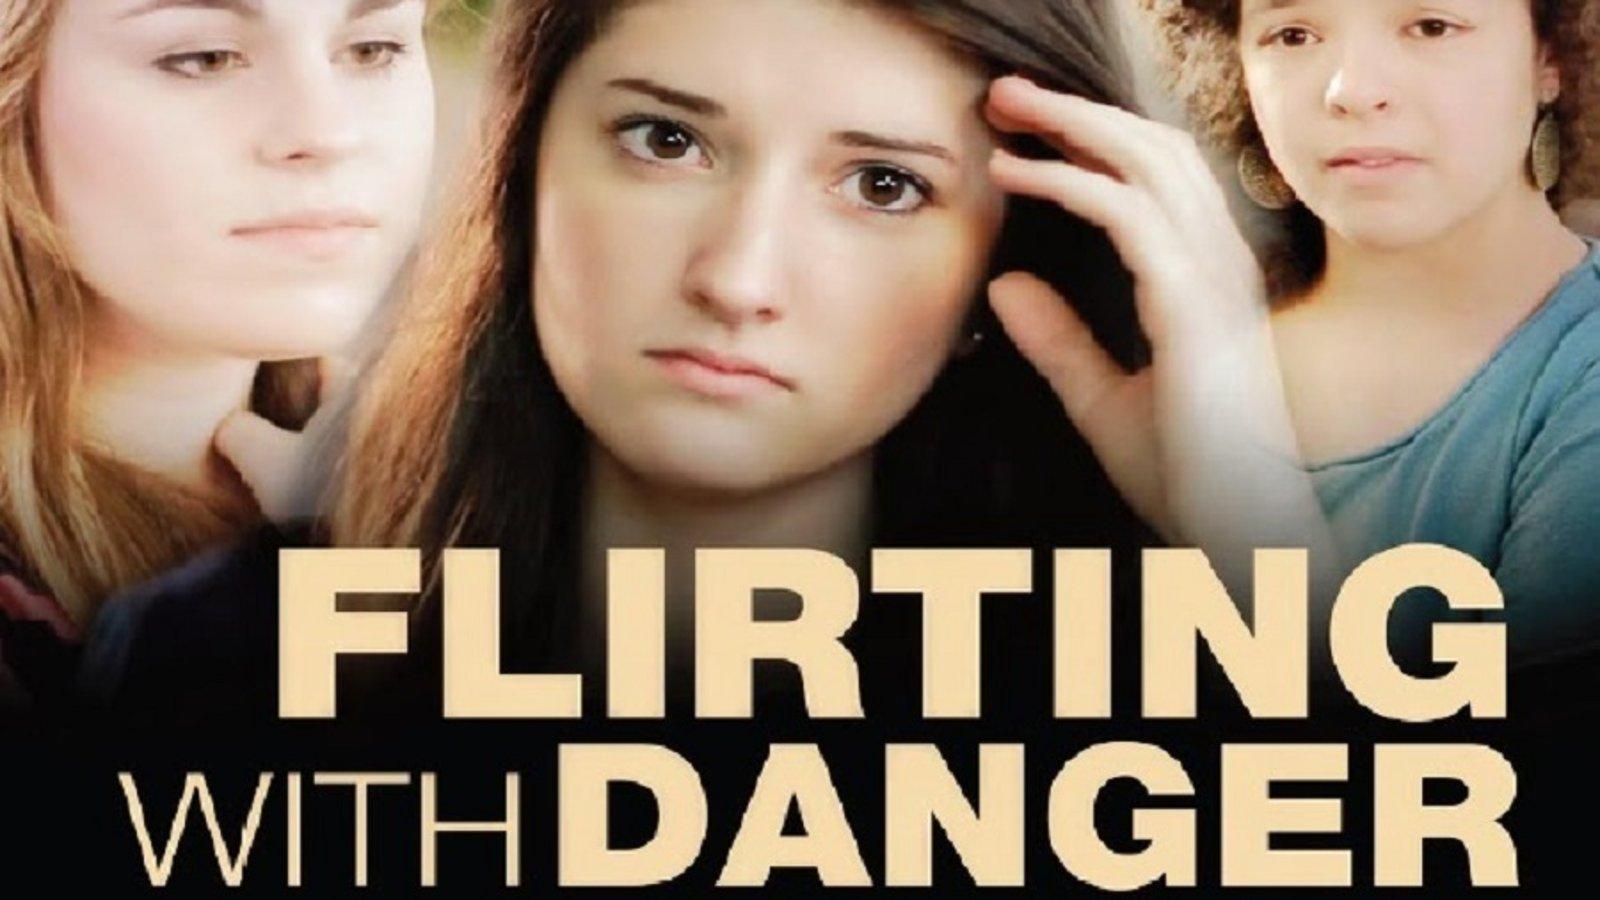 Flirting With Danger - Power & Choice in Heterosexual Relationships